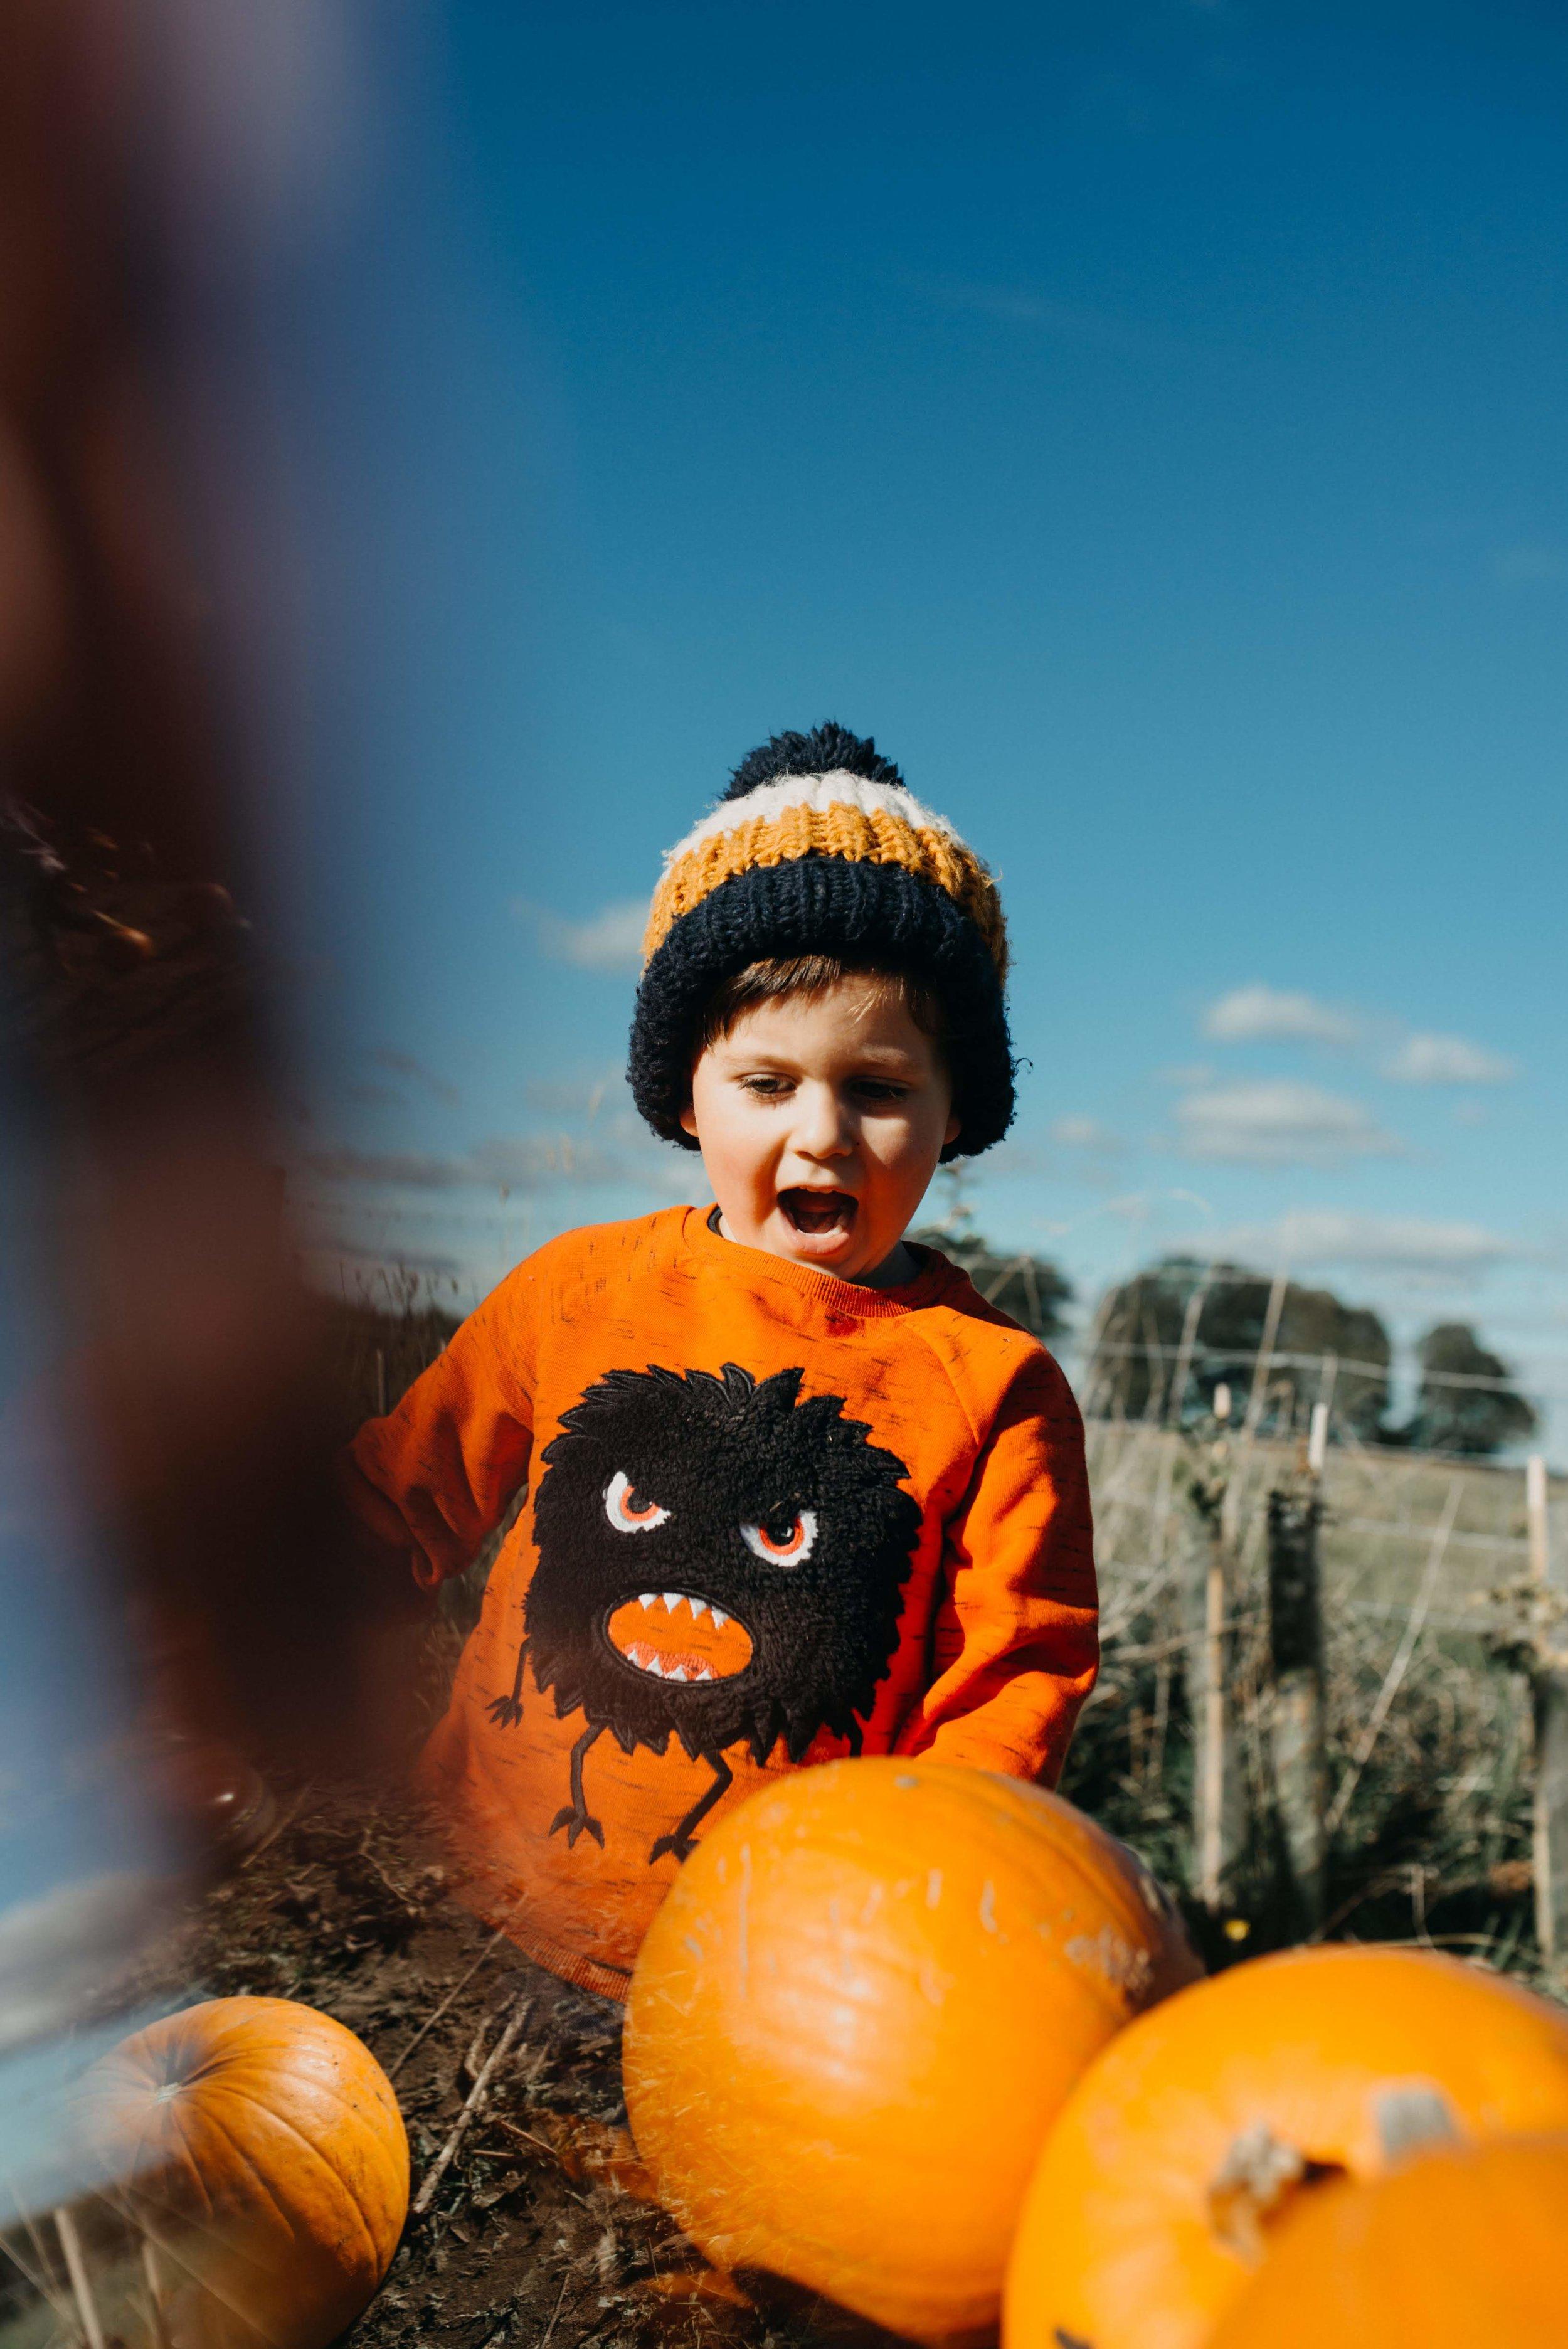 Pumpkin picking with Jesse, October 2018 - 56.jpg